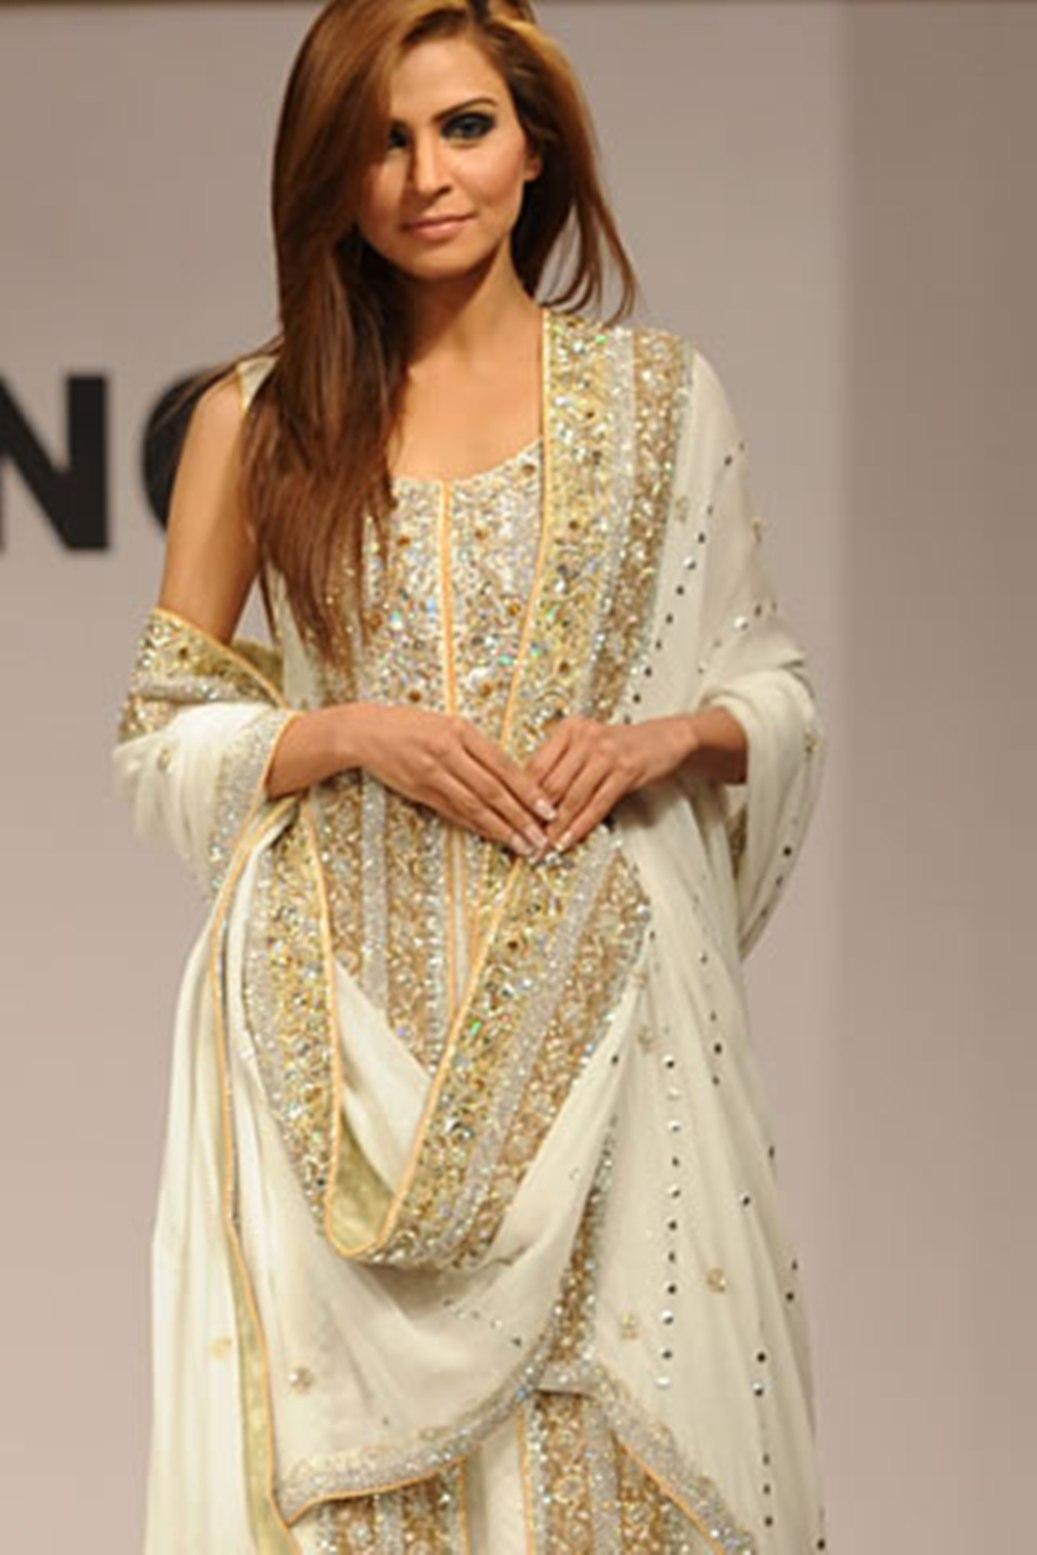 بالصور فساتين اعراس هندي , اجمل فستان هندى 247 2